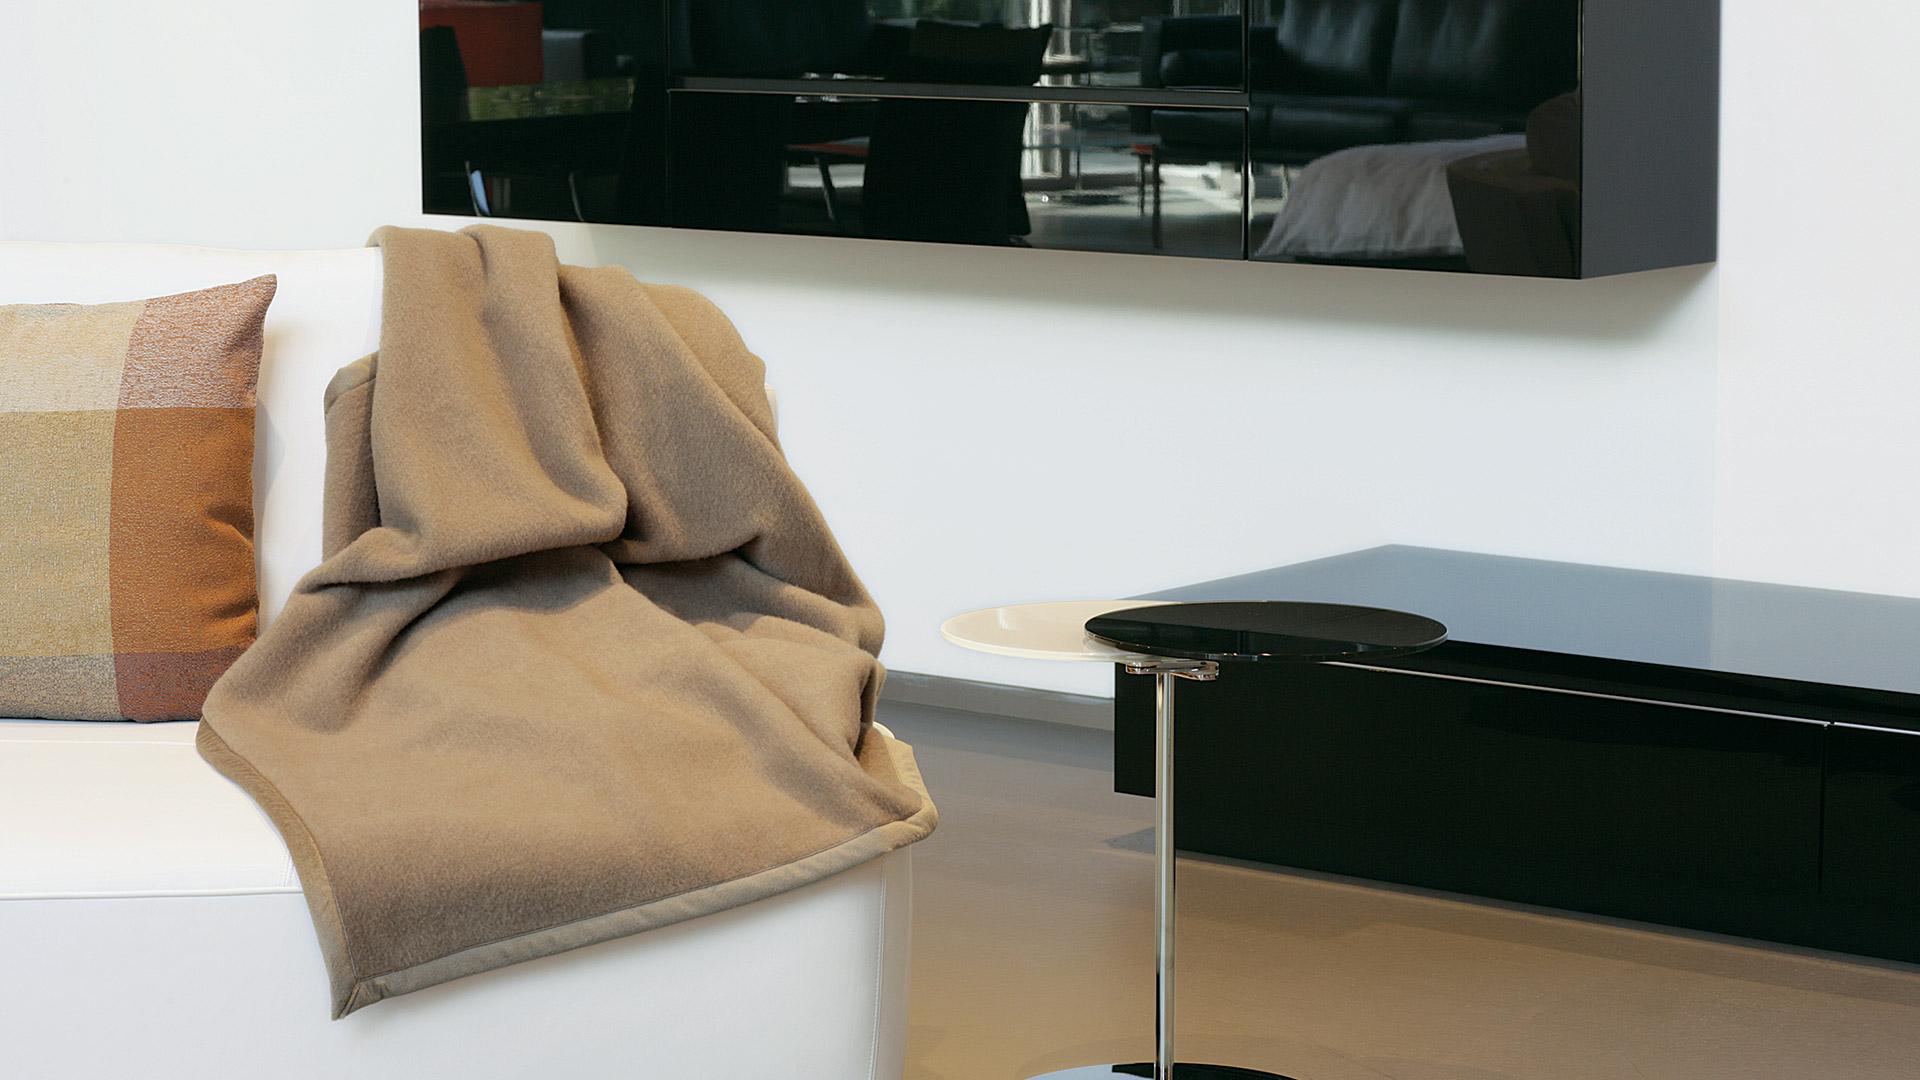 cashmere merino naturhaardecke eurasia. Black Bedroom Furniture Sets. Home Design Ideas